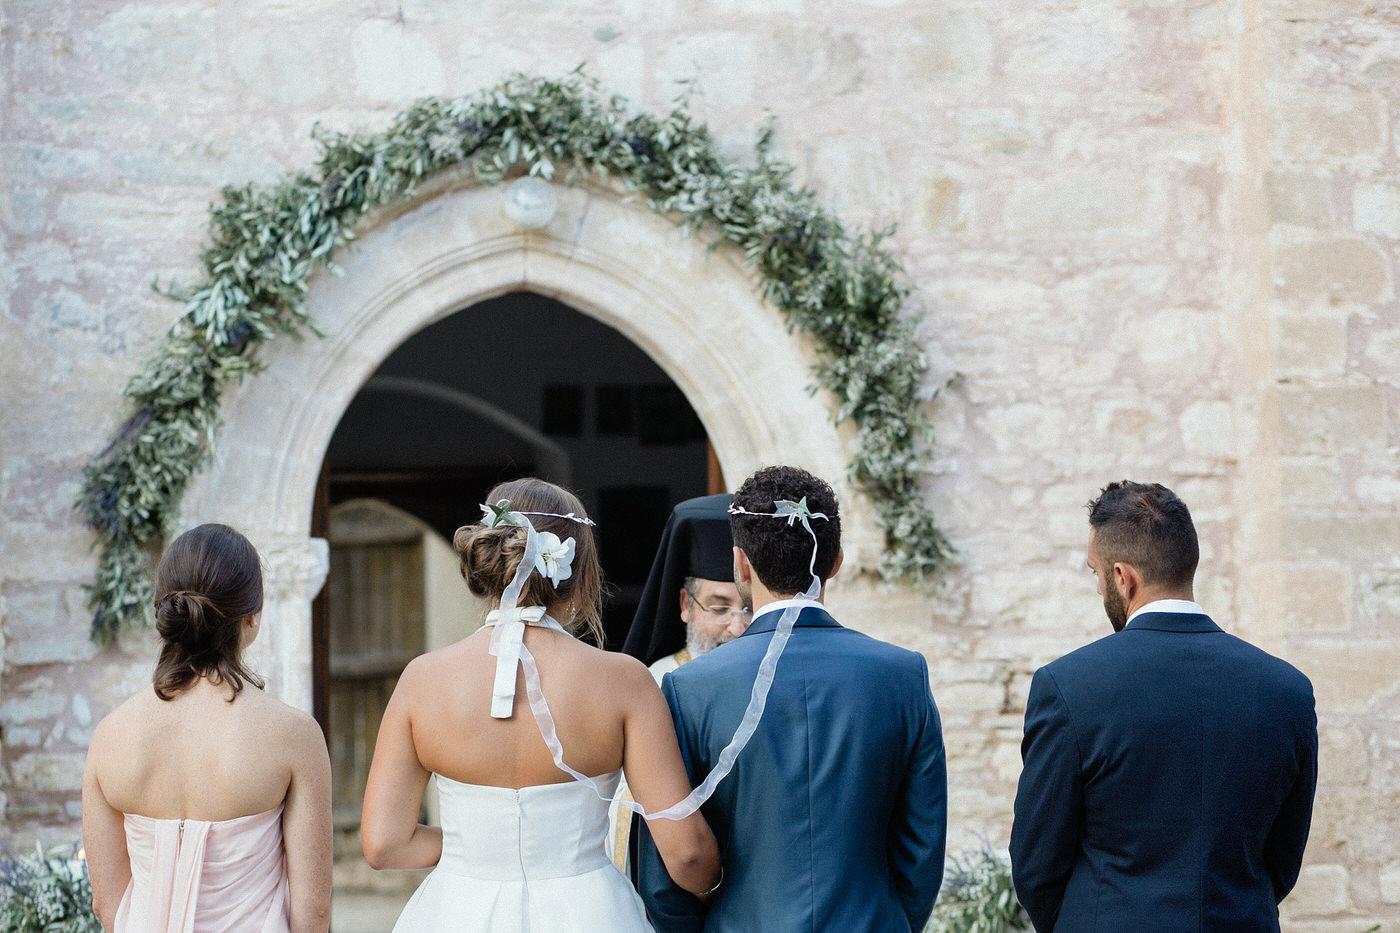 cyprus-wedding-photographer-27.JPG